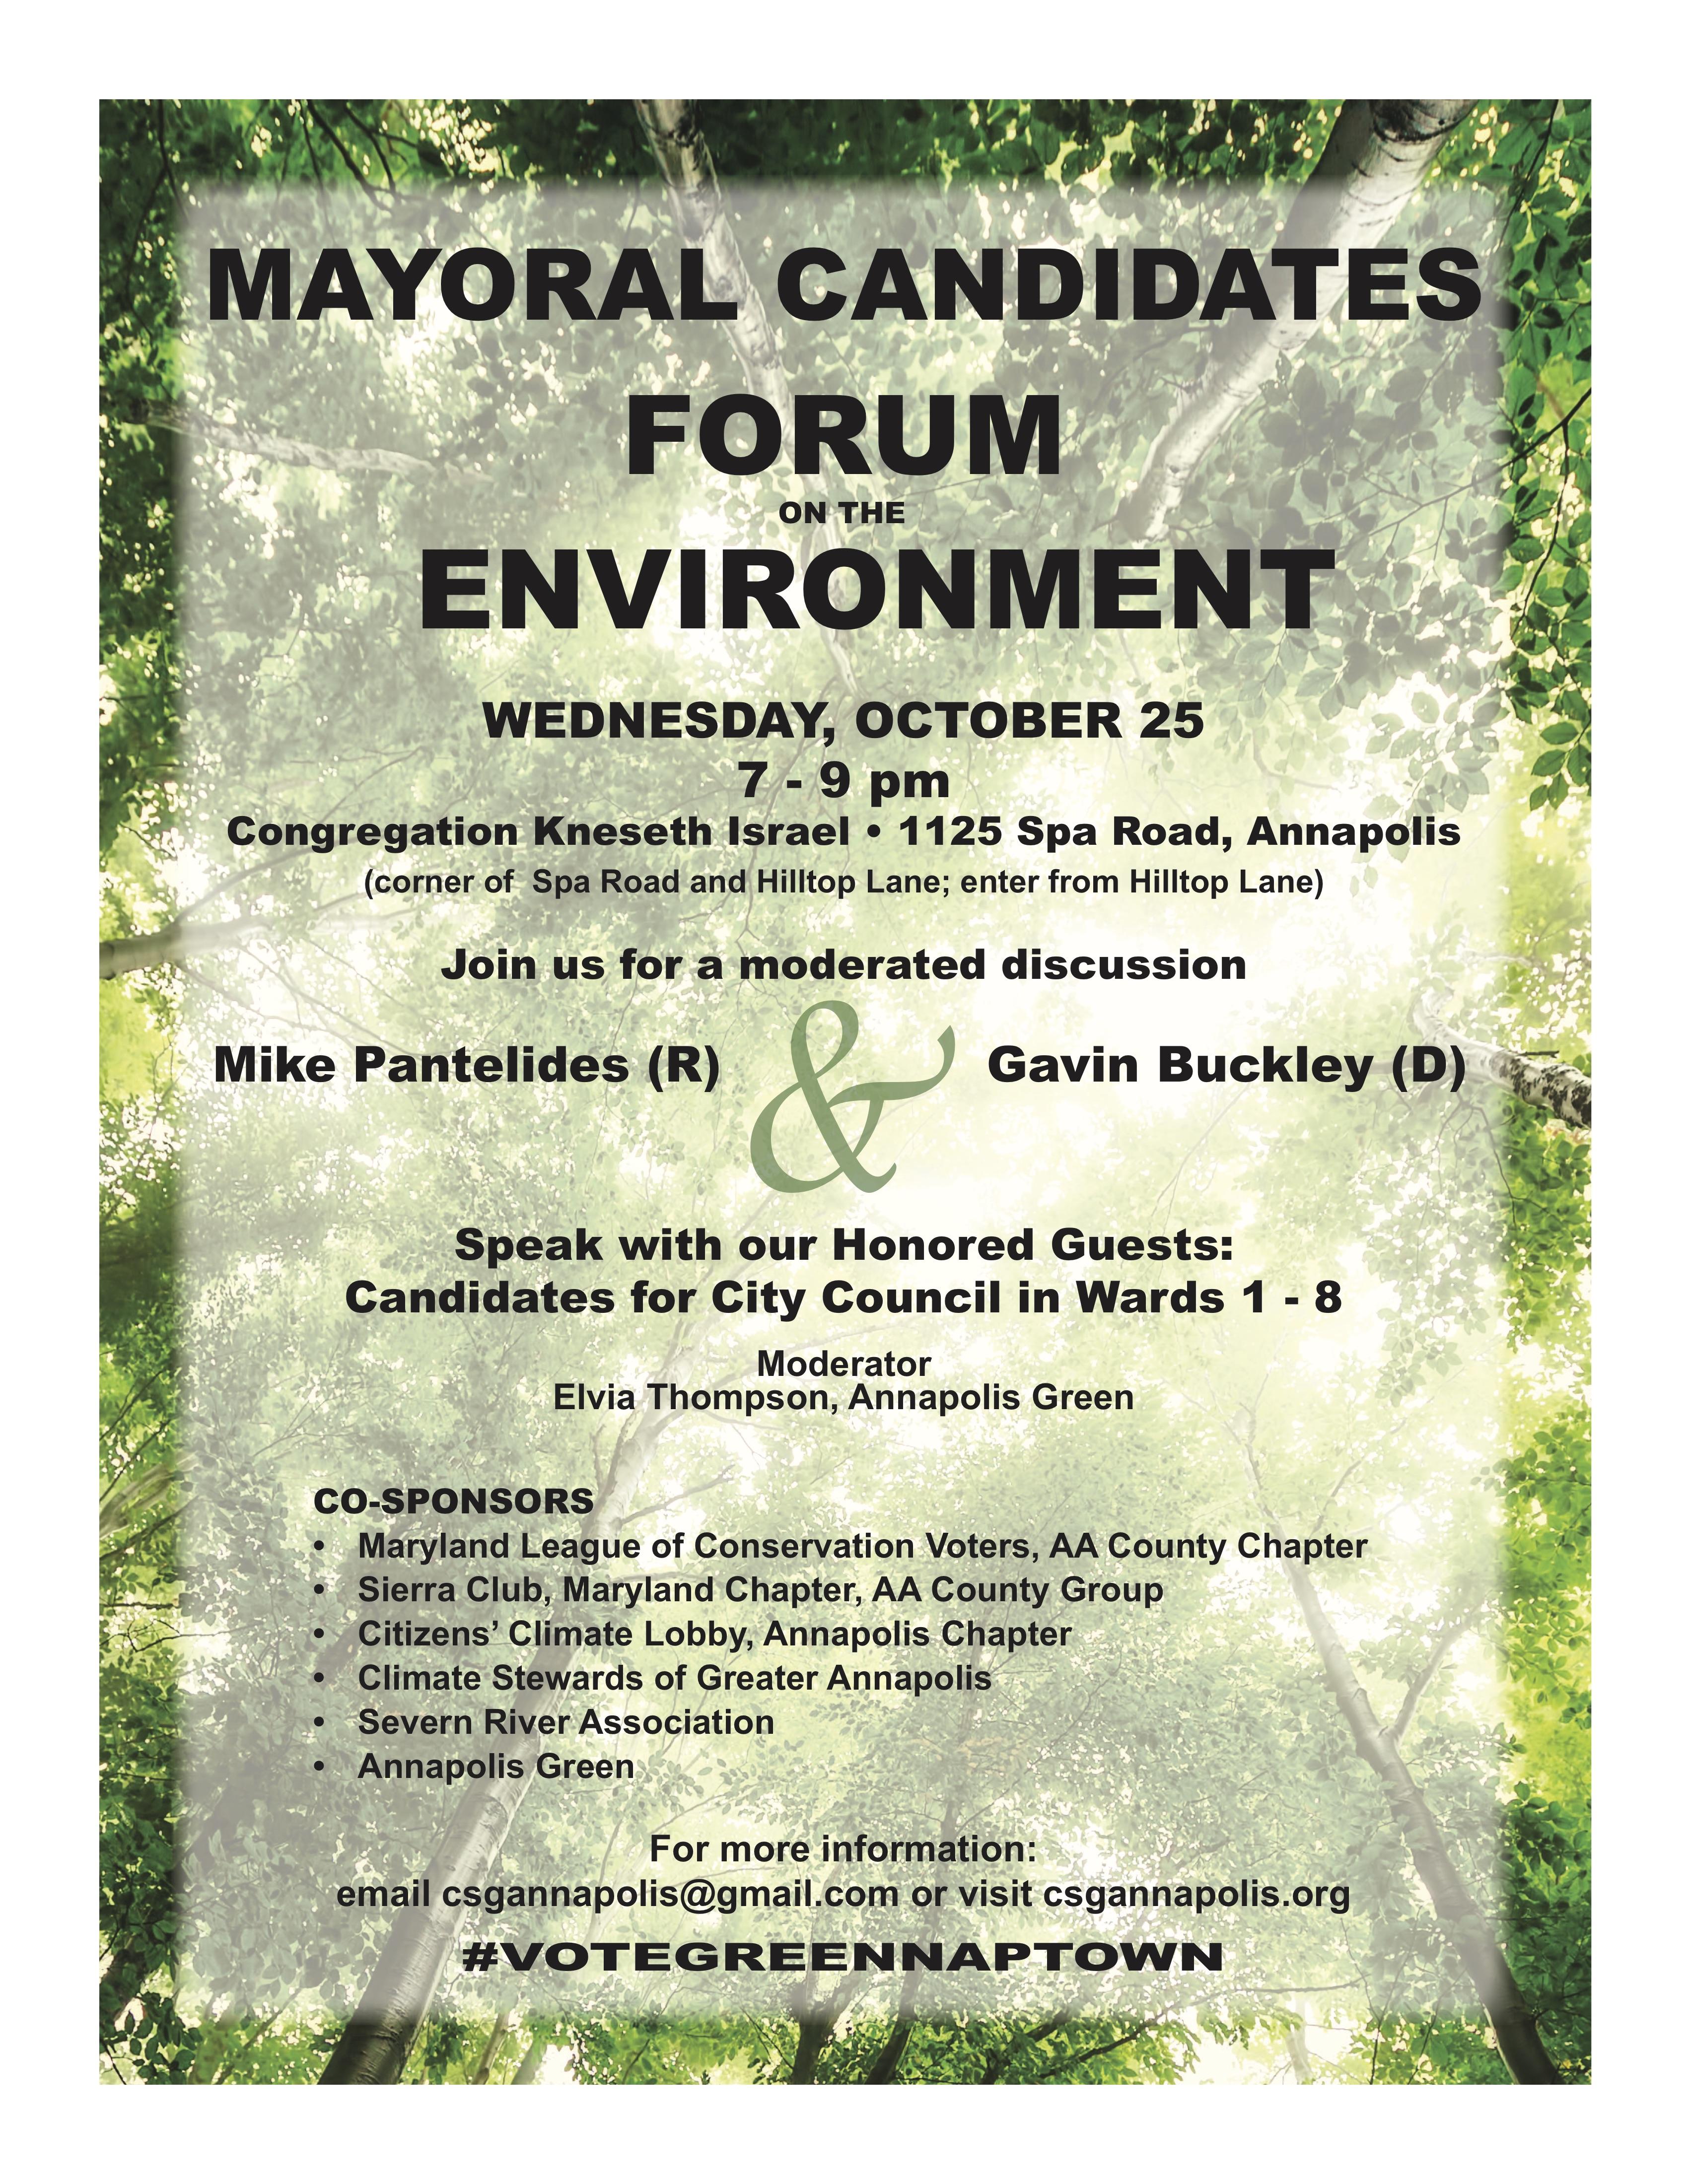 Annapolis_Candidates_Forum_Flyer_9.26.2017.jpg